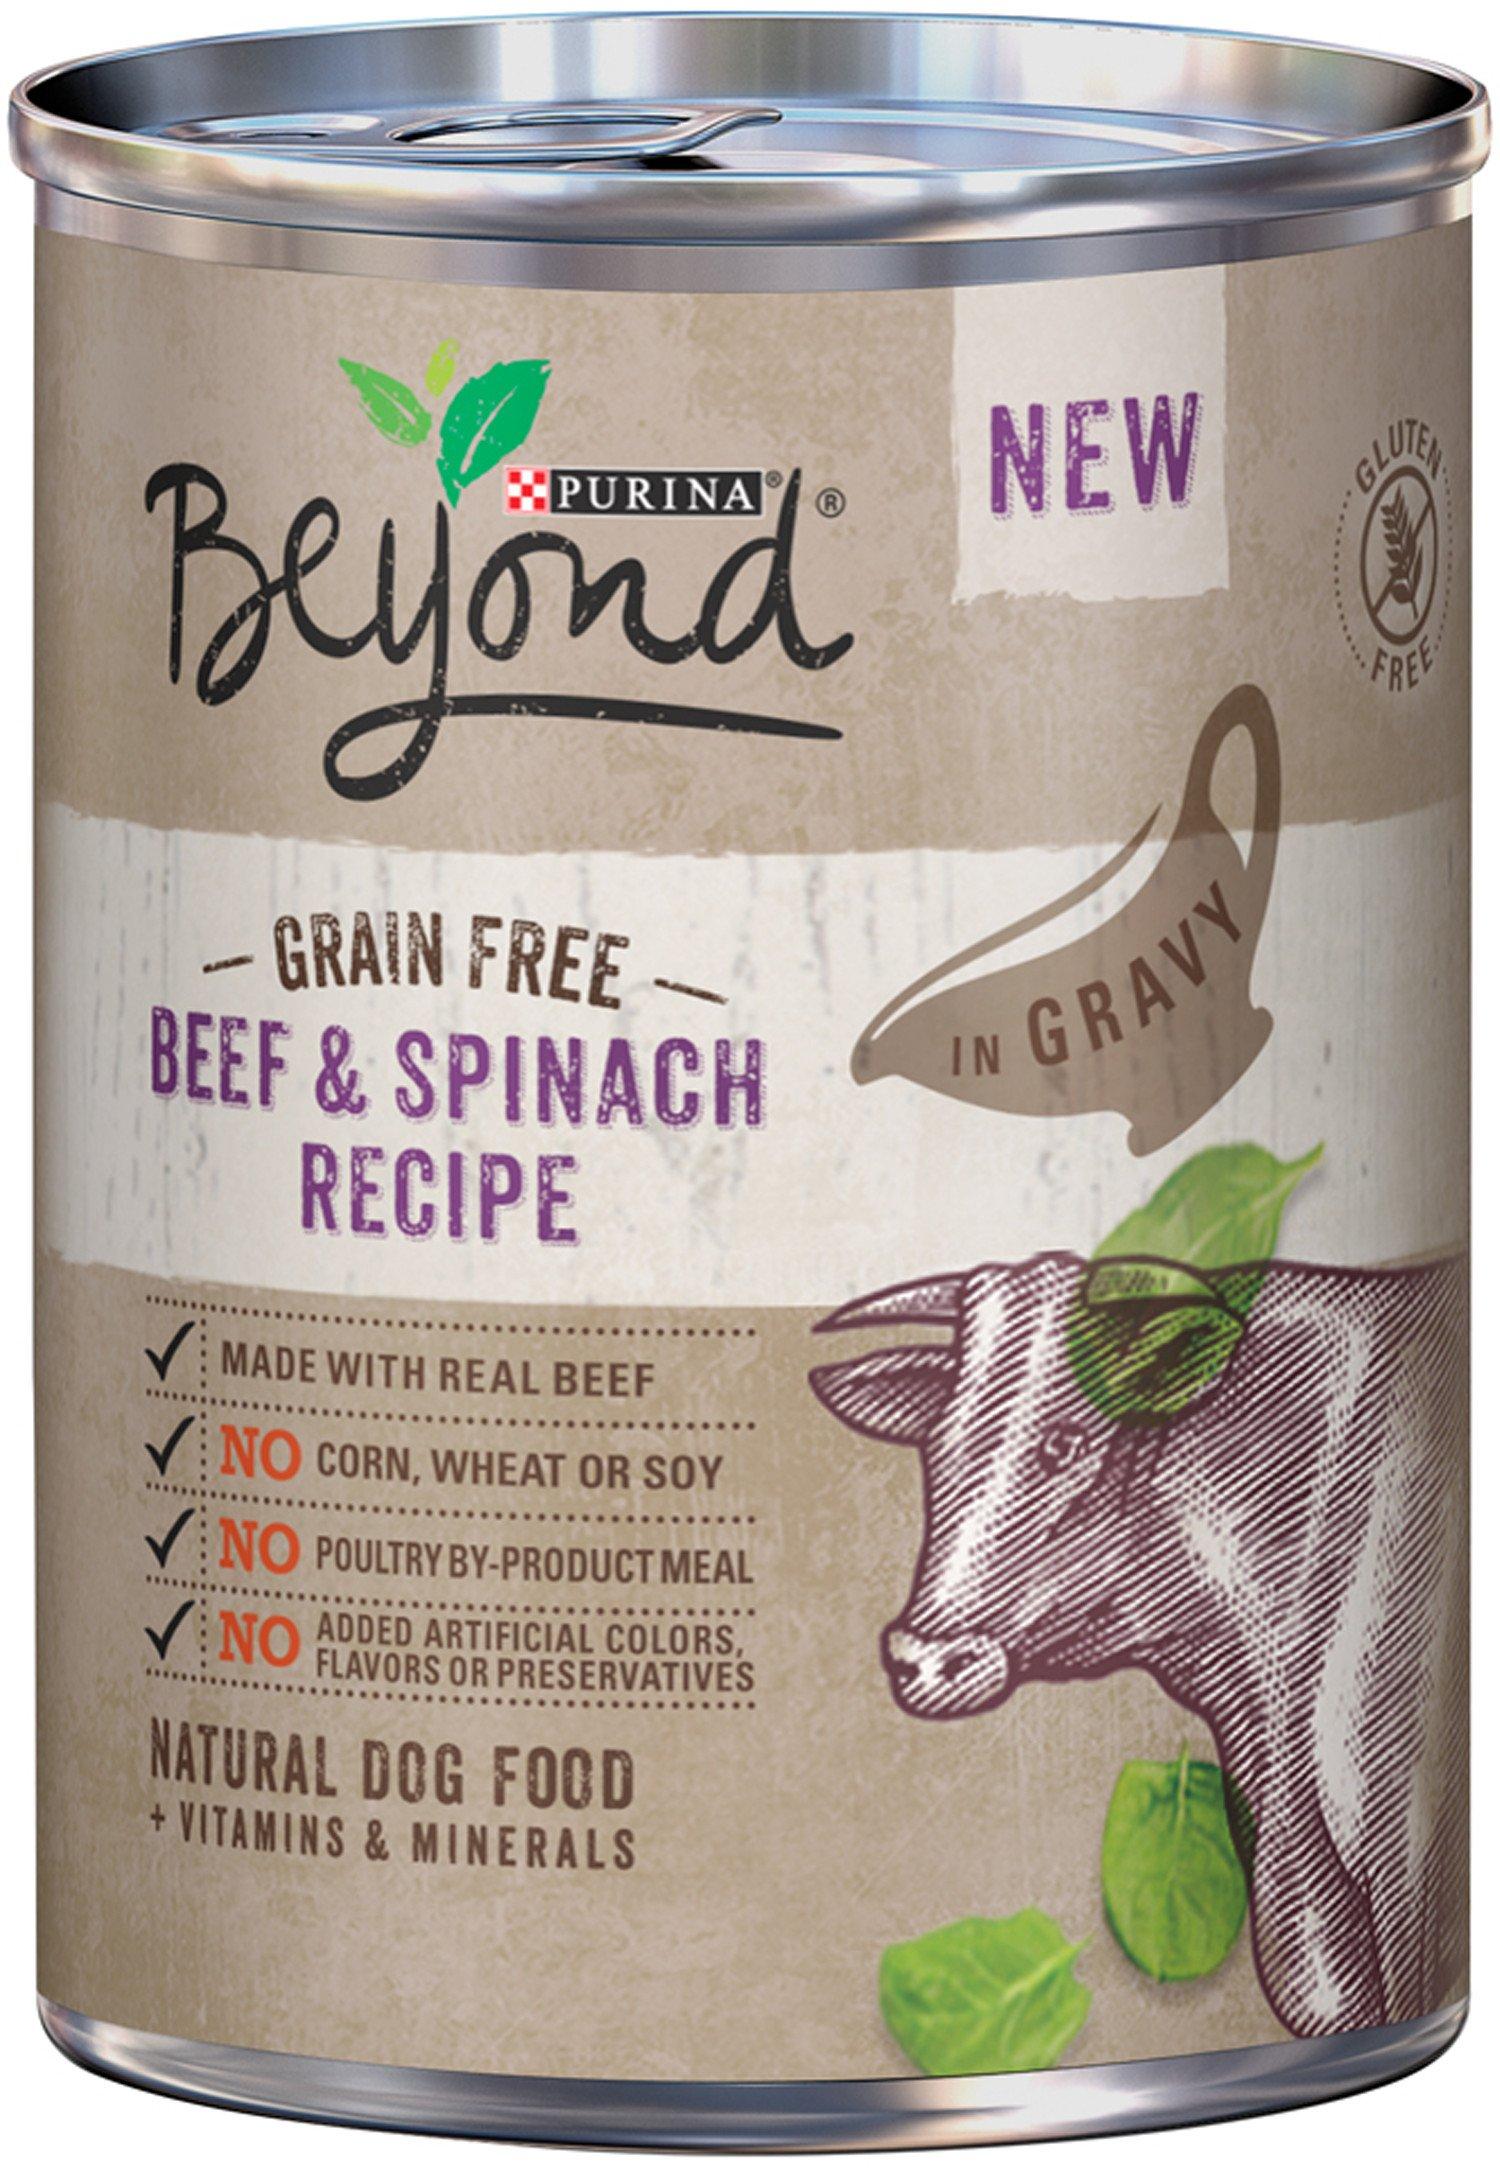 Purina Beyond Grain Free Adult Wet Dog Food